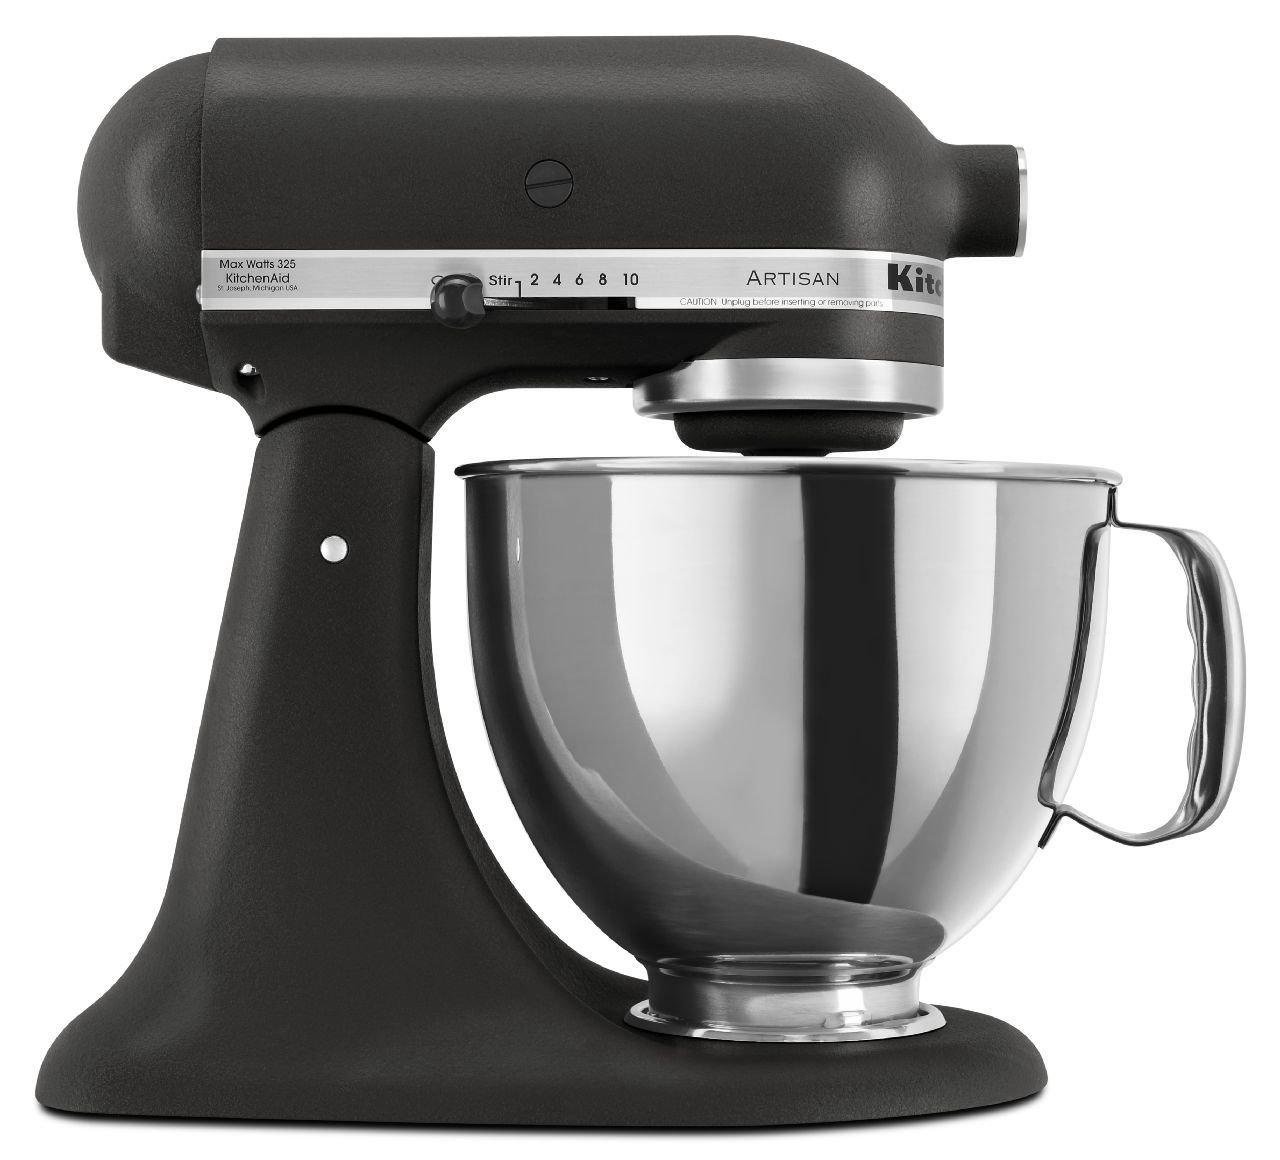 KitchenAid KSM150PSBM 5 qt. Artisan Series Stand Mixer - Black Matte by KitchenAid